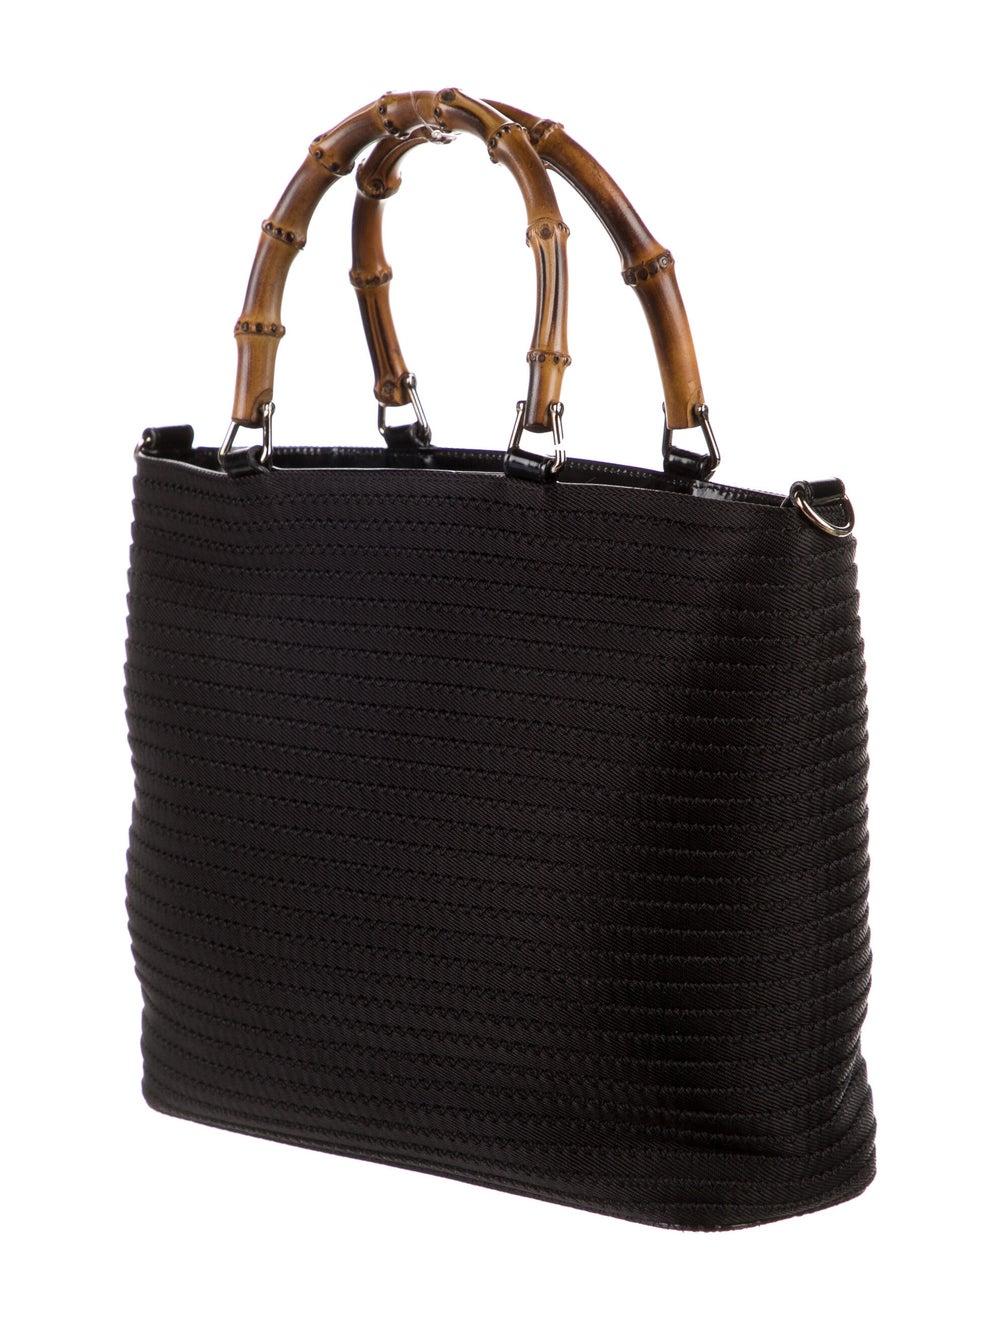 Gucci Vintage Nylon Bamboo Tote Black - image 3